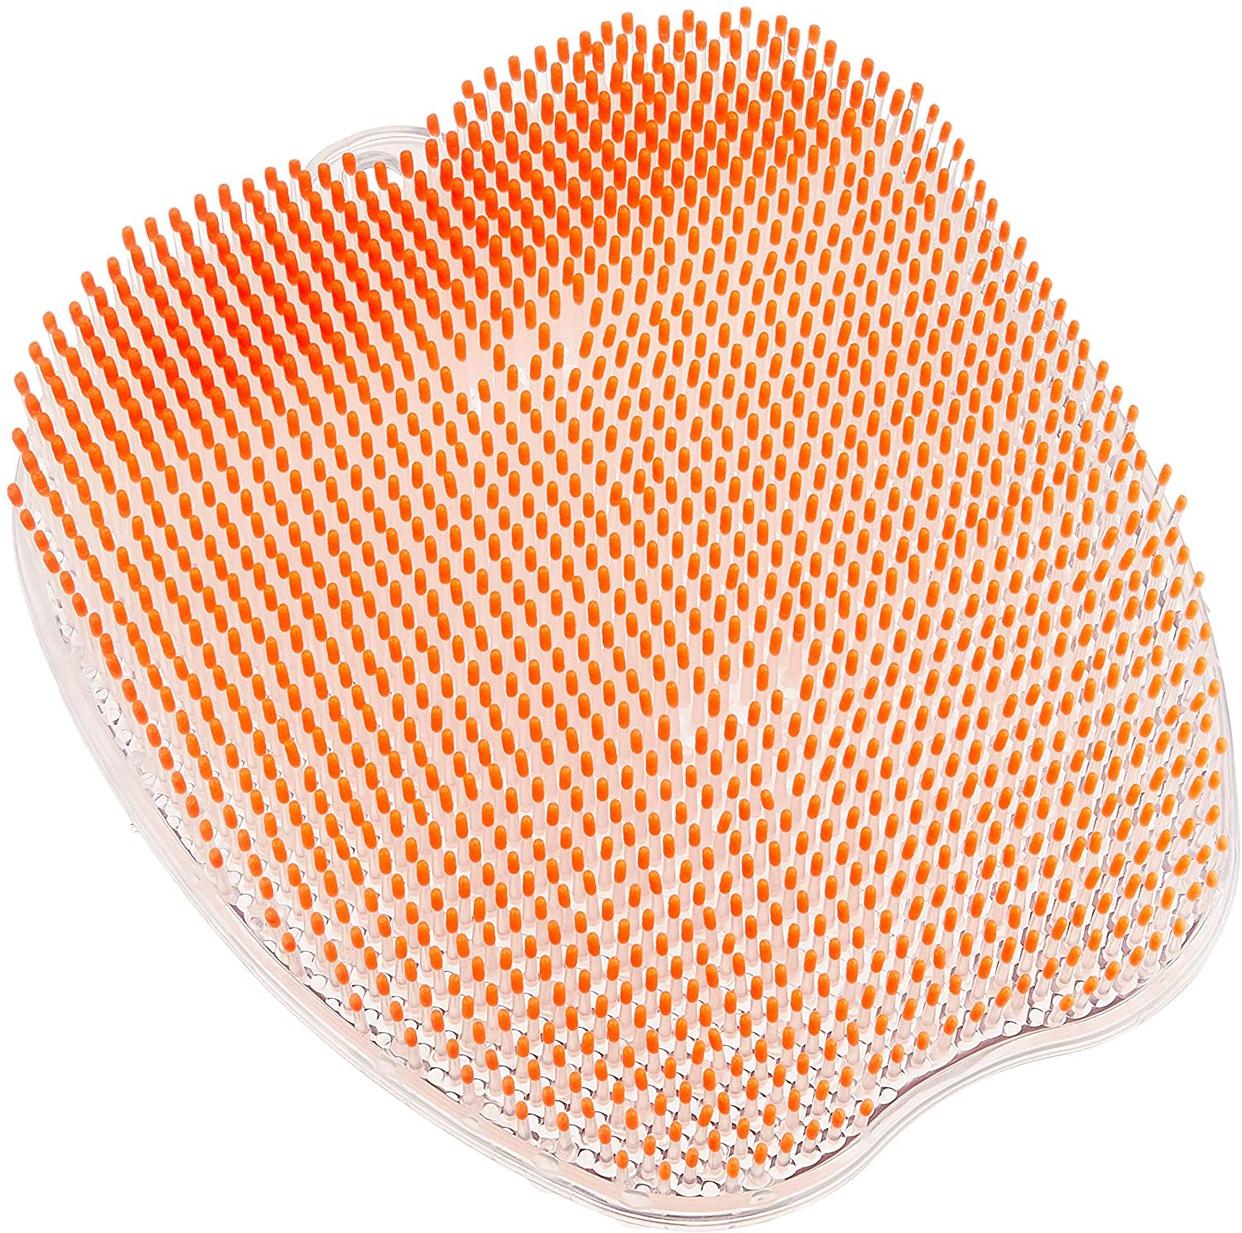 Sunpac(サンパック) フットグルーマーグランの商品画像